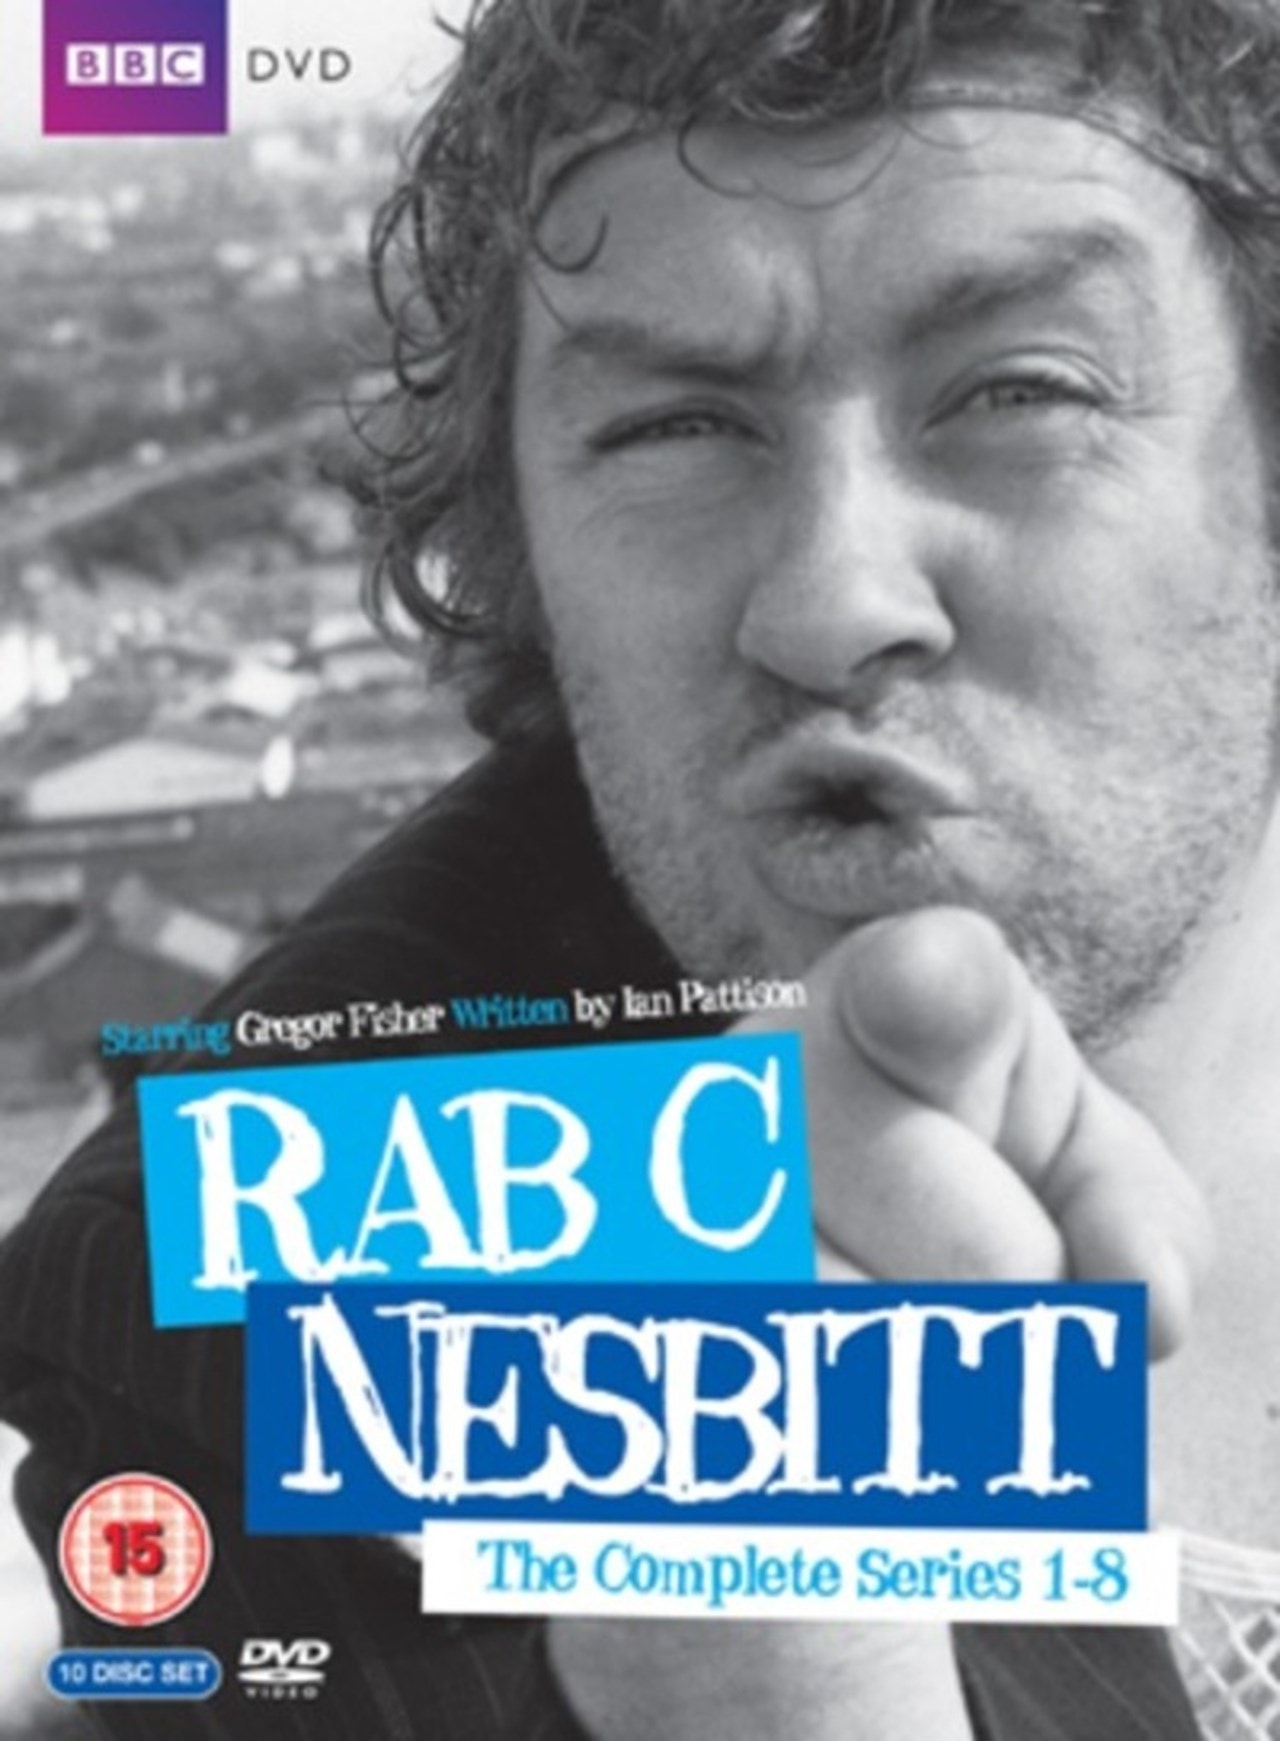 Rab C Nesbitt: The Complete Series 1-8 - 1